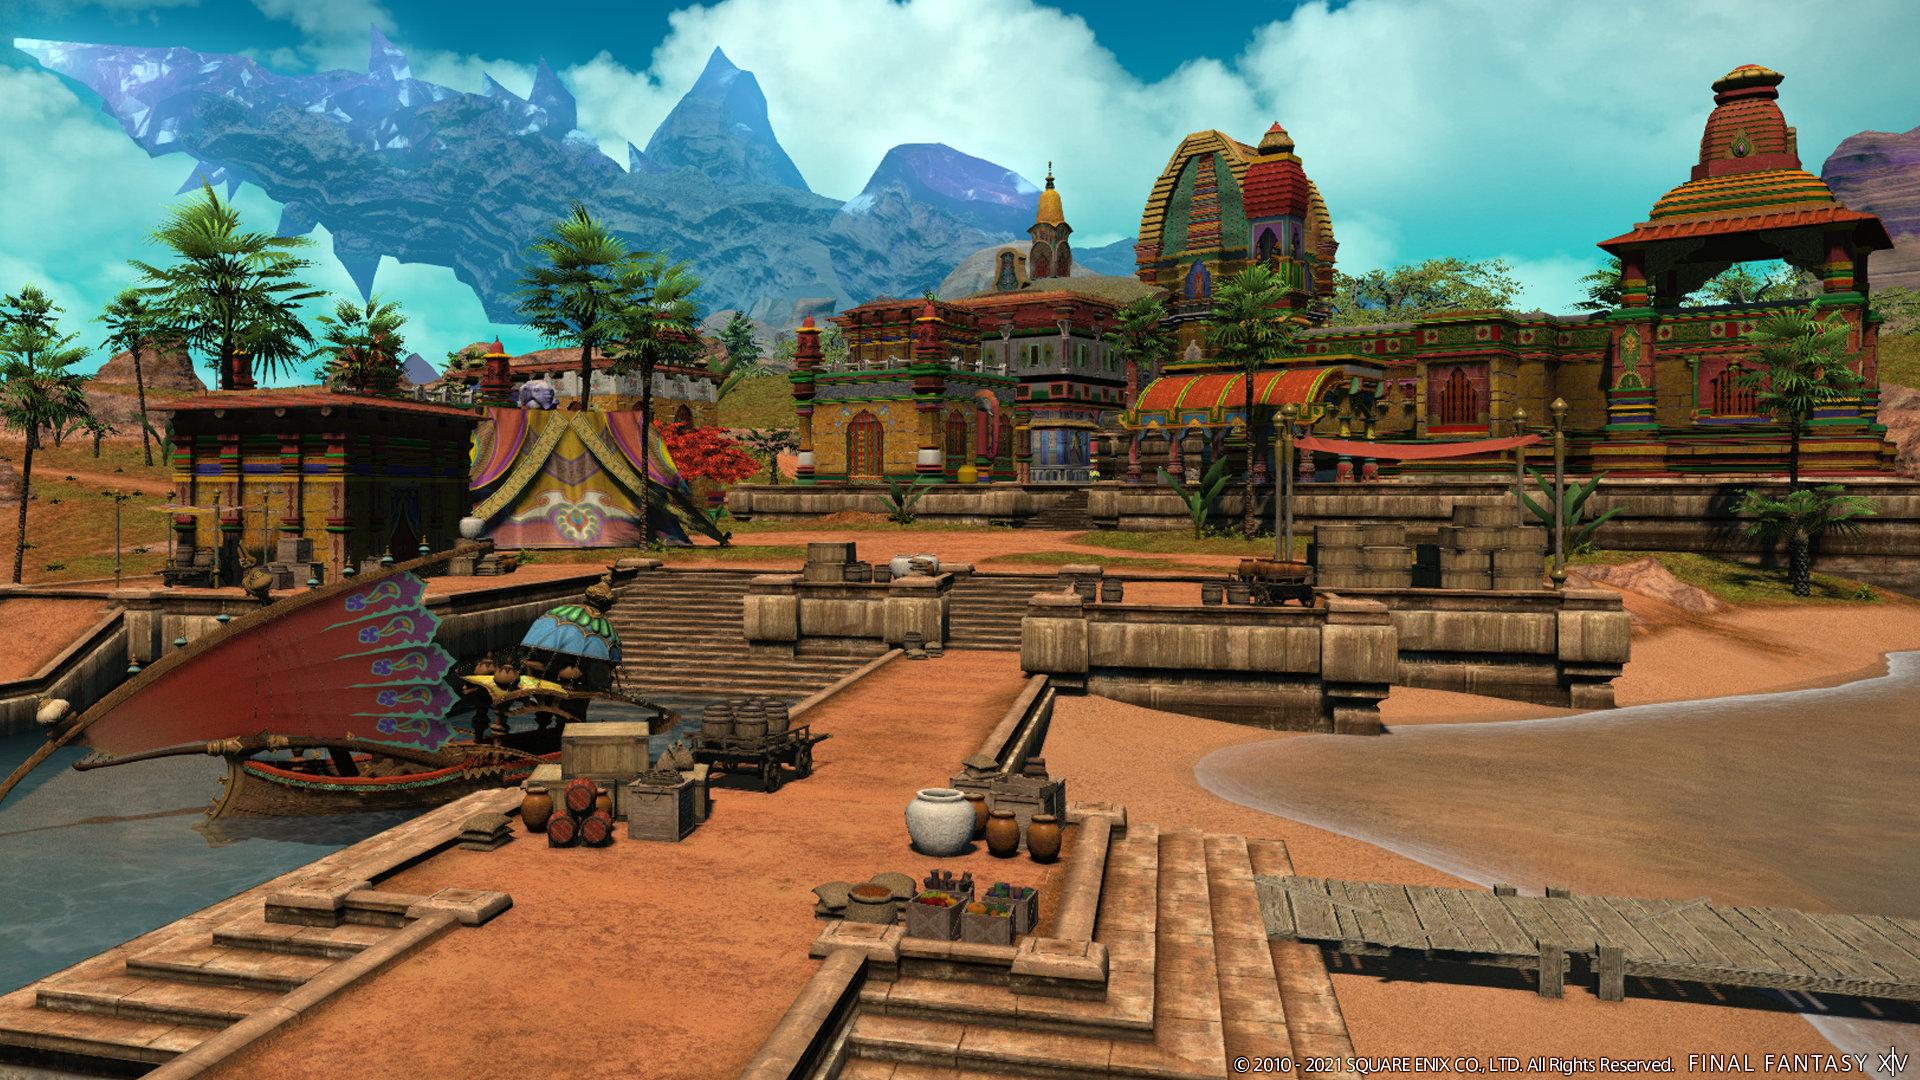 Final Fantasy XIV screenshot of a colorful coastal city of stone and brick.